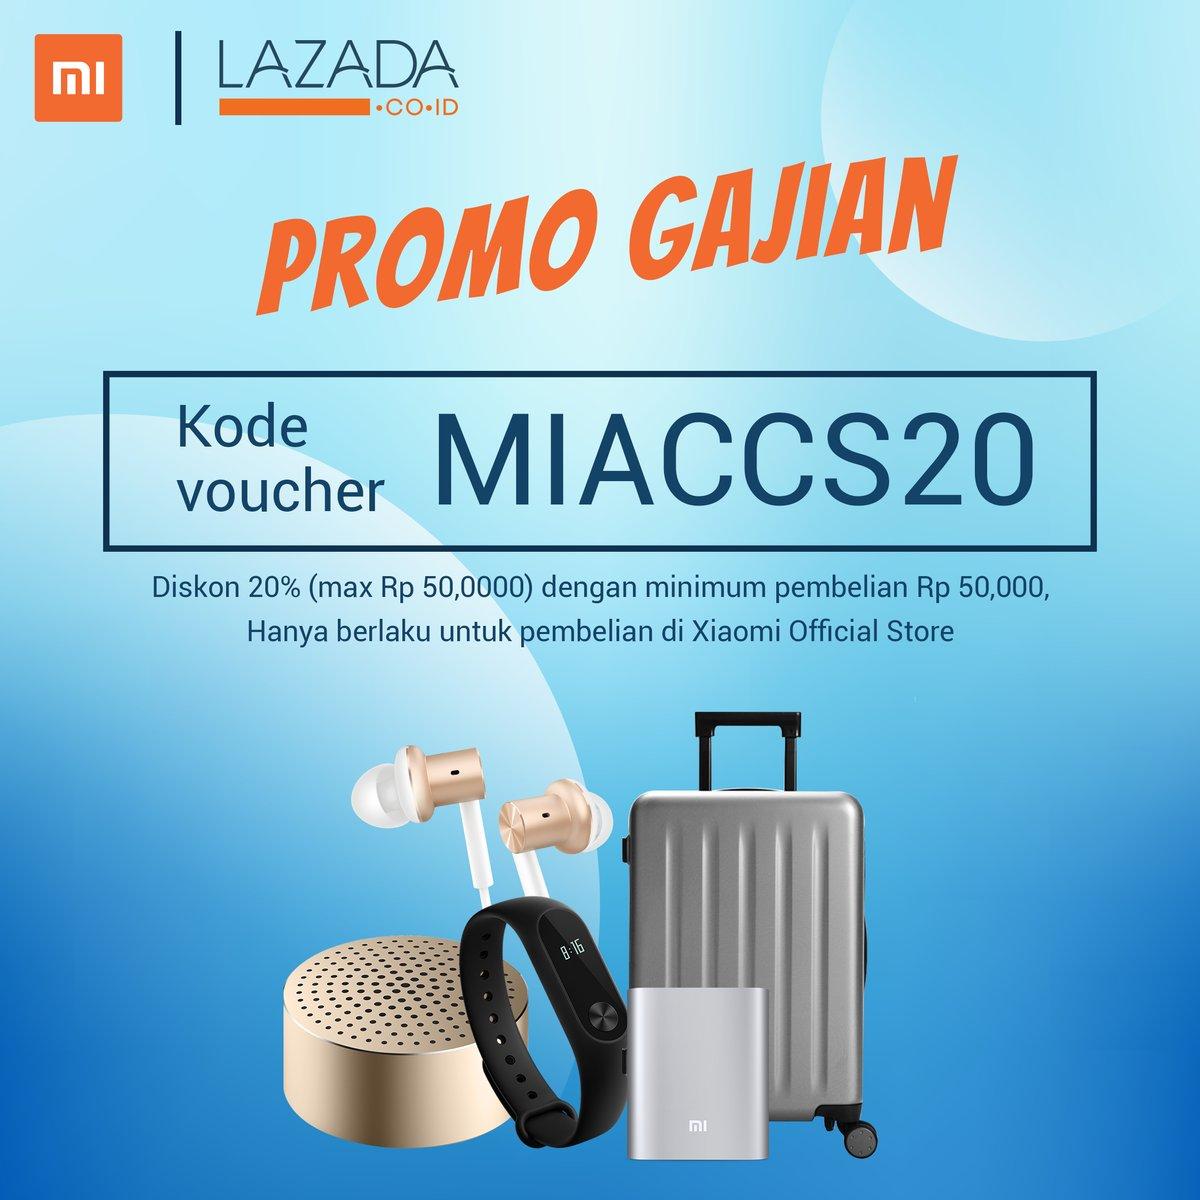 Lazada Voucher Promo Diskon 20 Di Xiaomi Official Store Promosi247 Tempatnya Info Promosi Diskon Terbaru